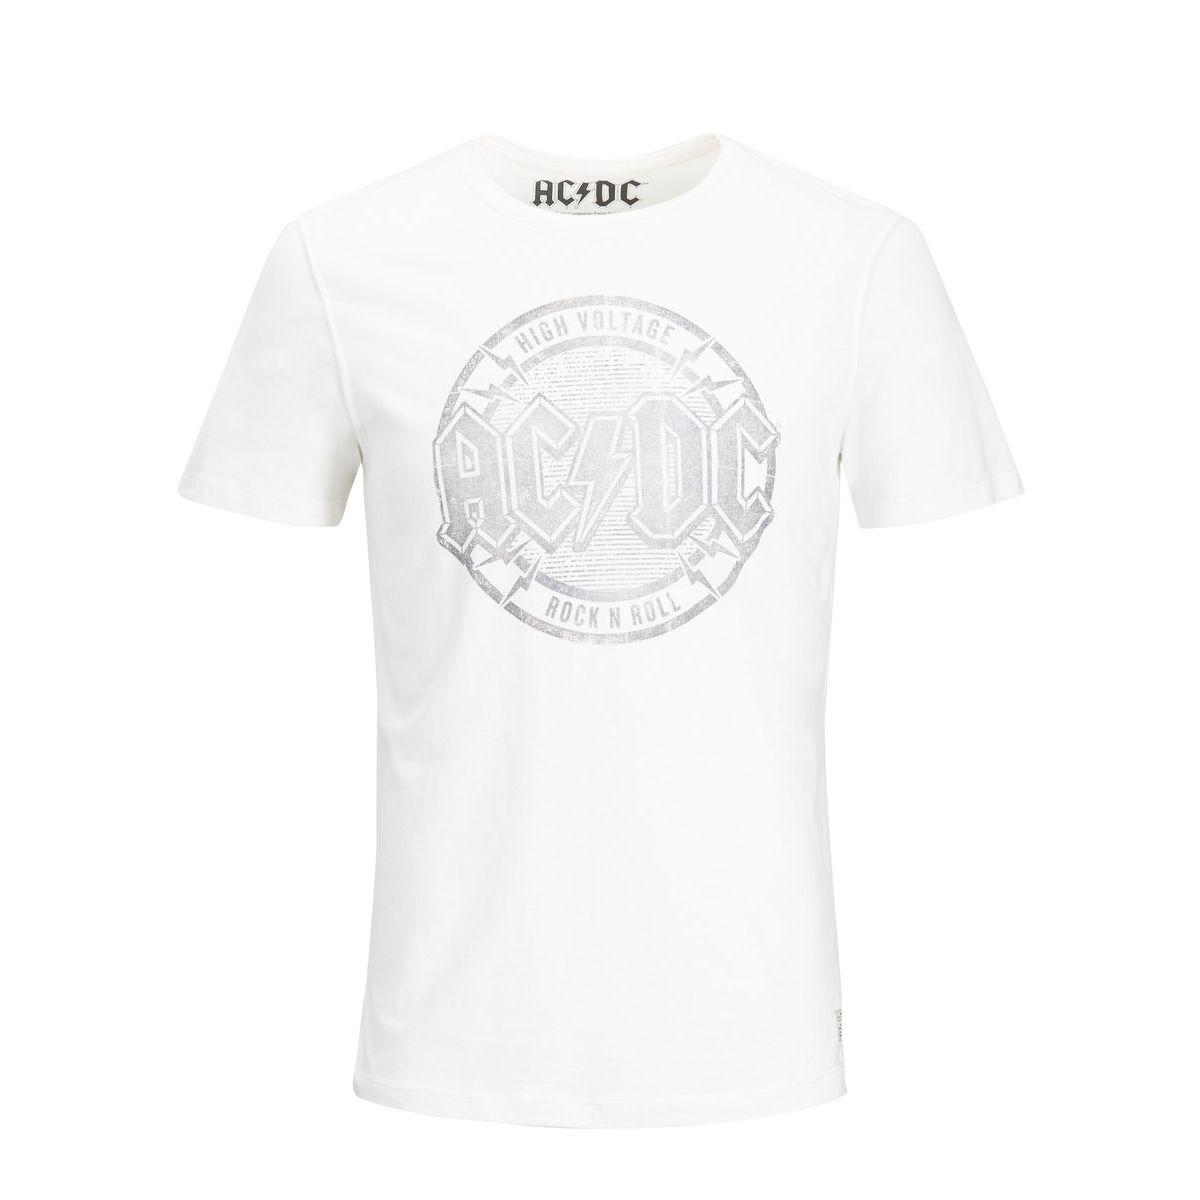 Jack & Jones Band- T-Shirt